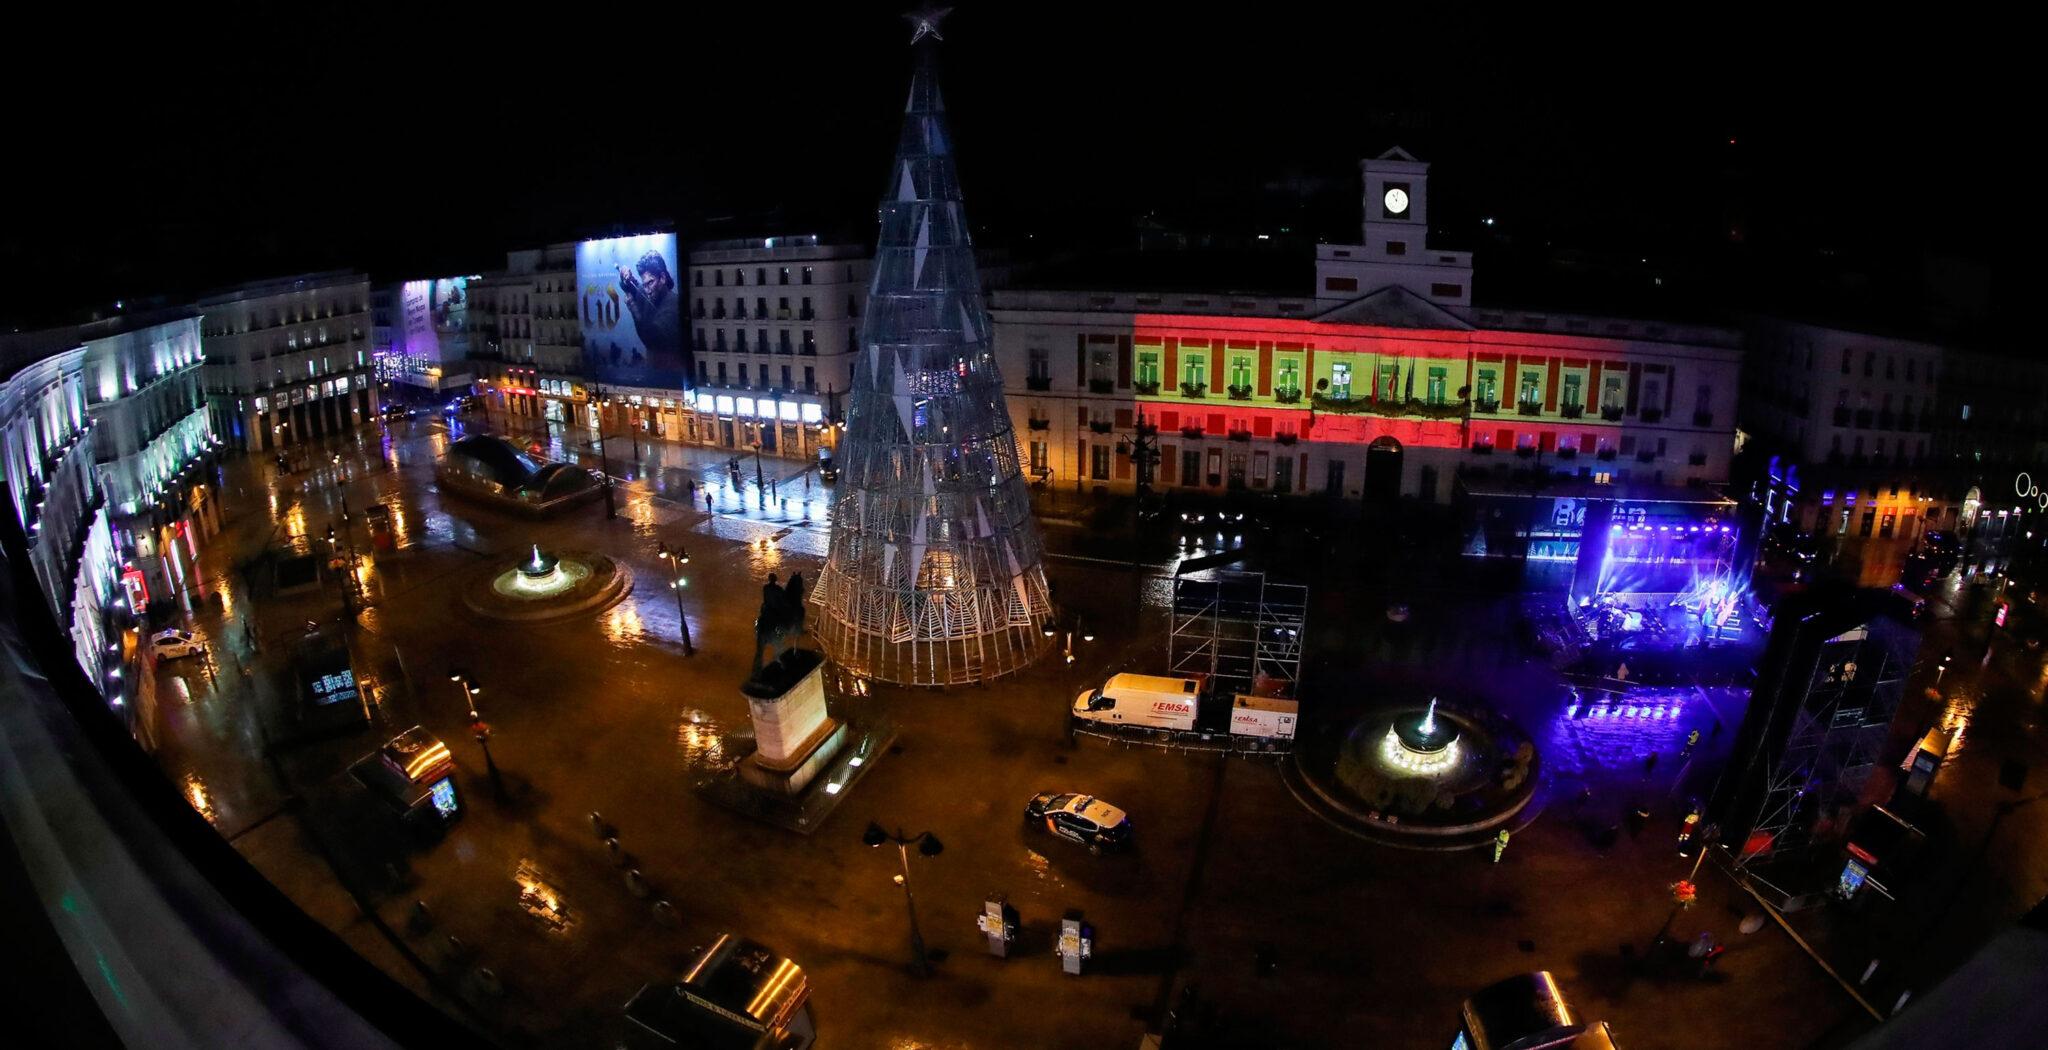 Puerta del sol. Nochevieja desierta. Nacho Cano